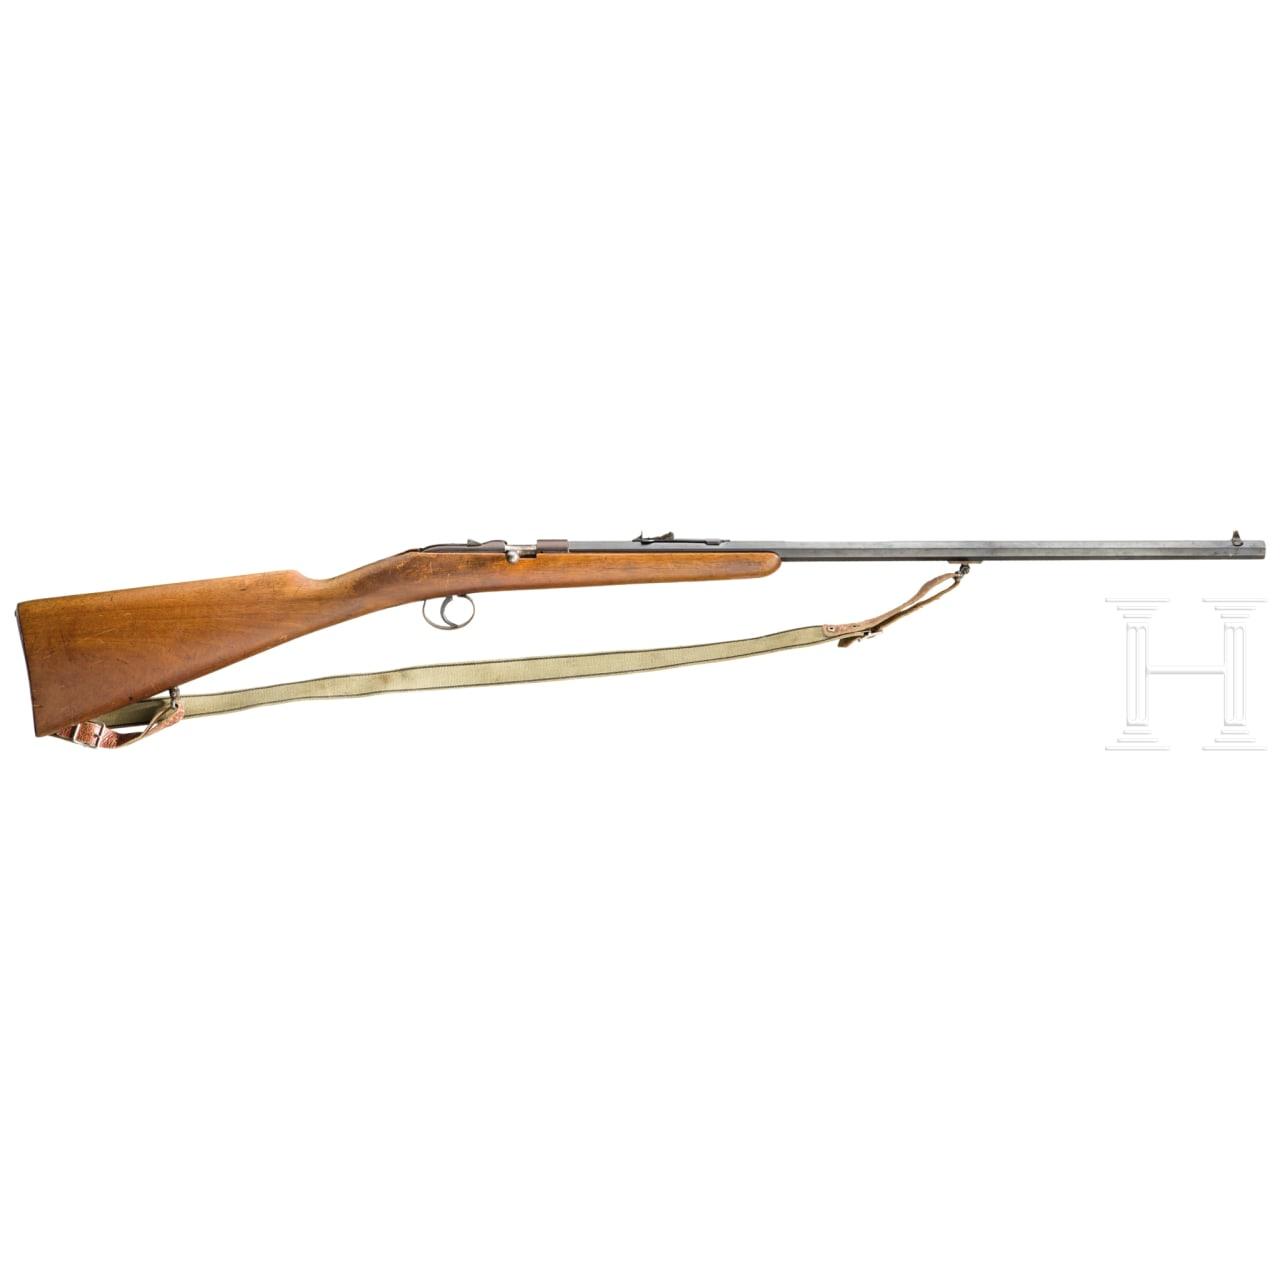 A rifle Husqvarna Mod. 55, circa 1930